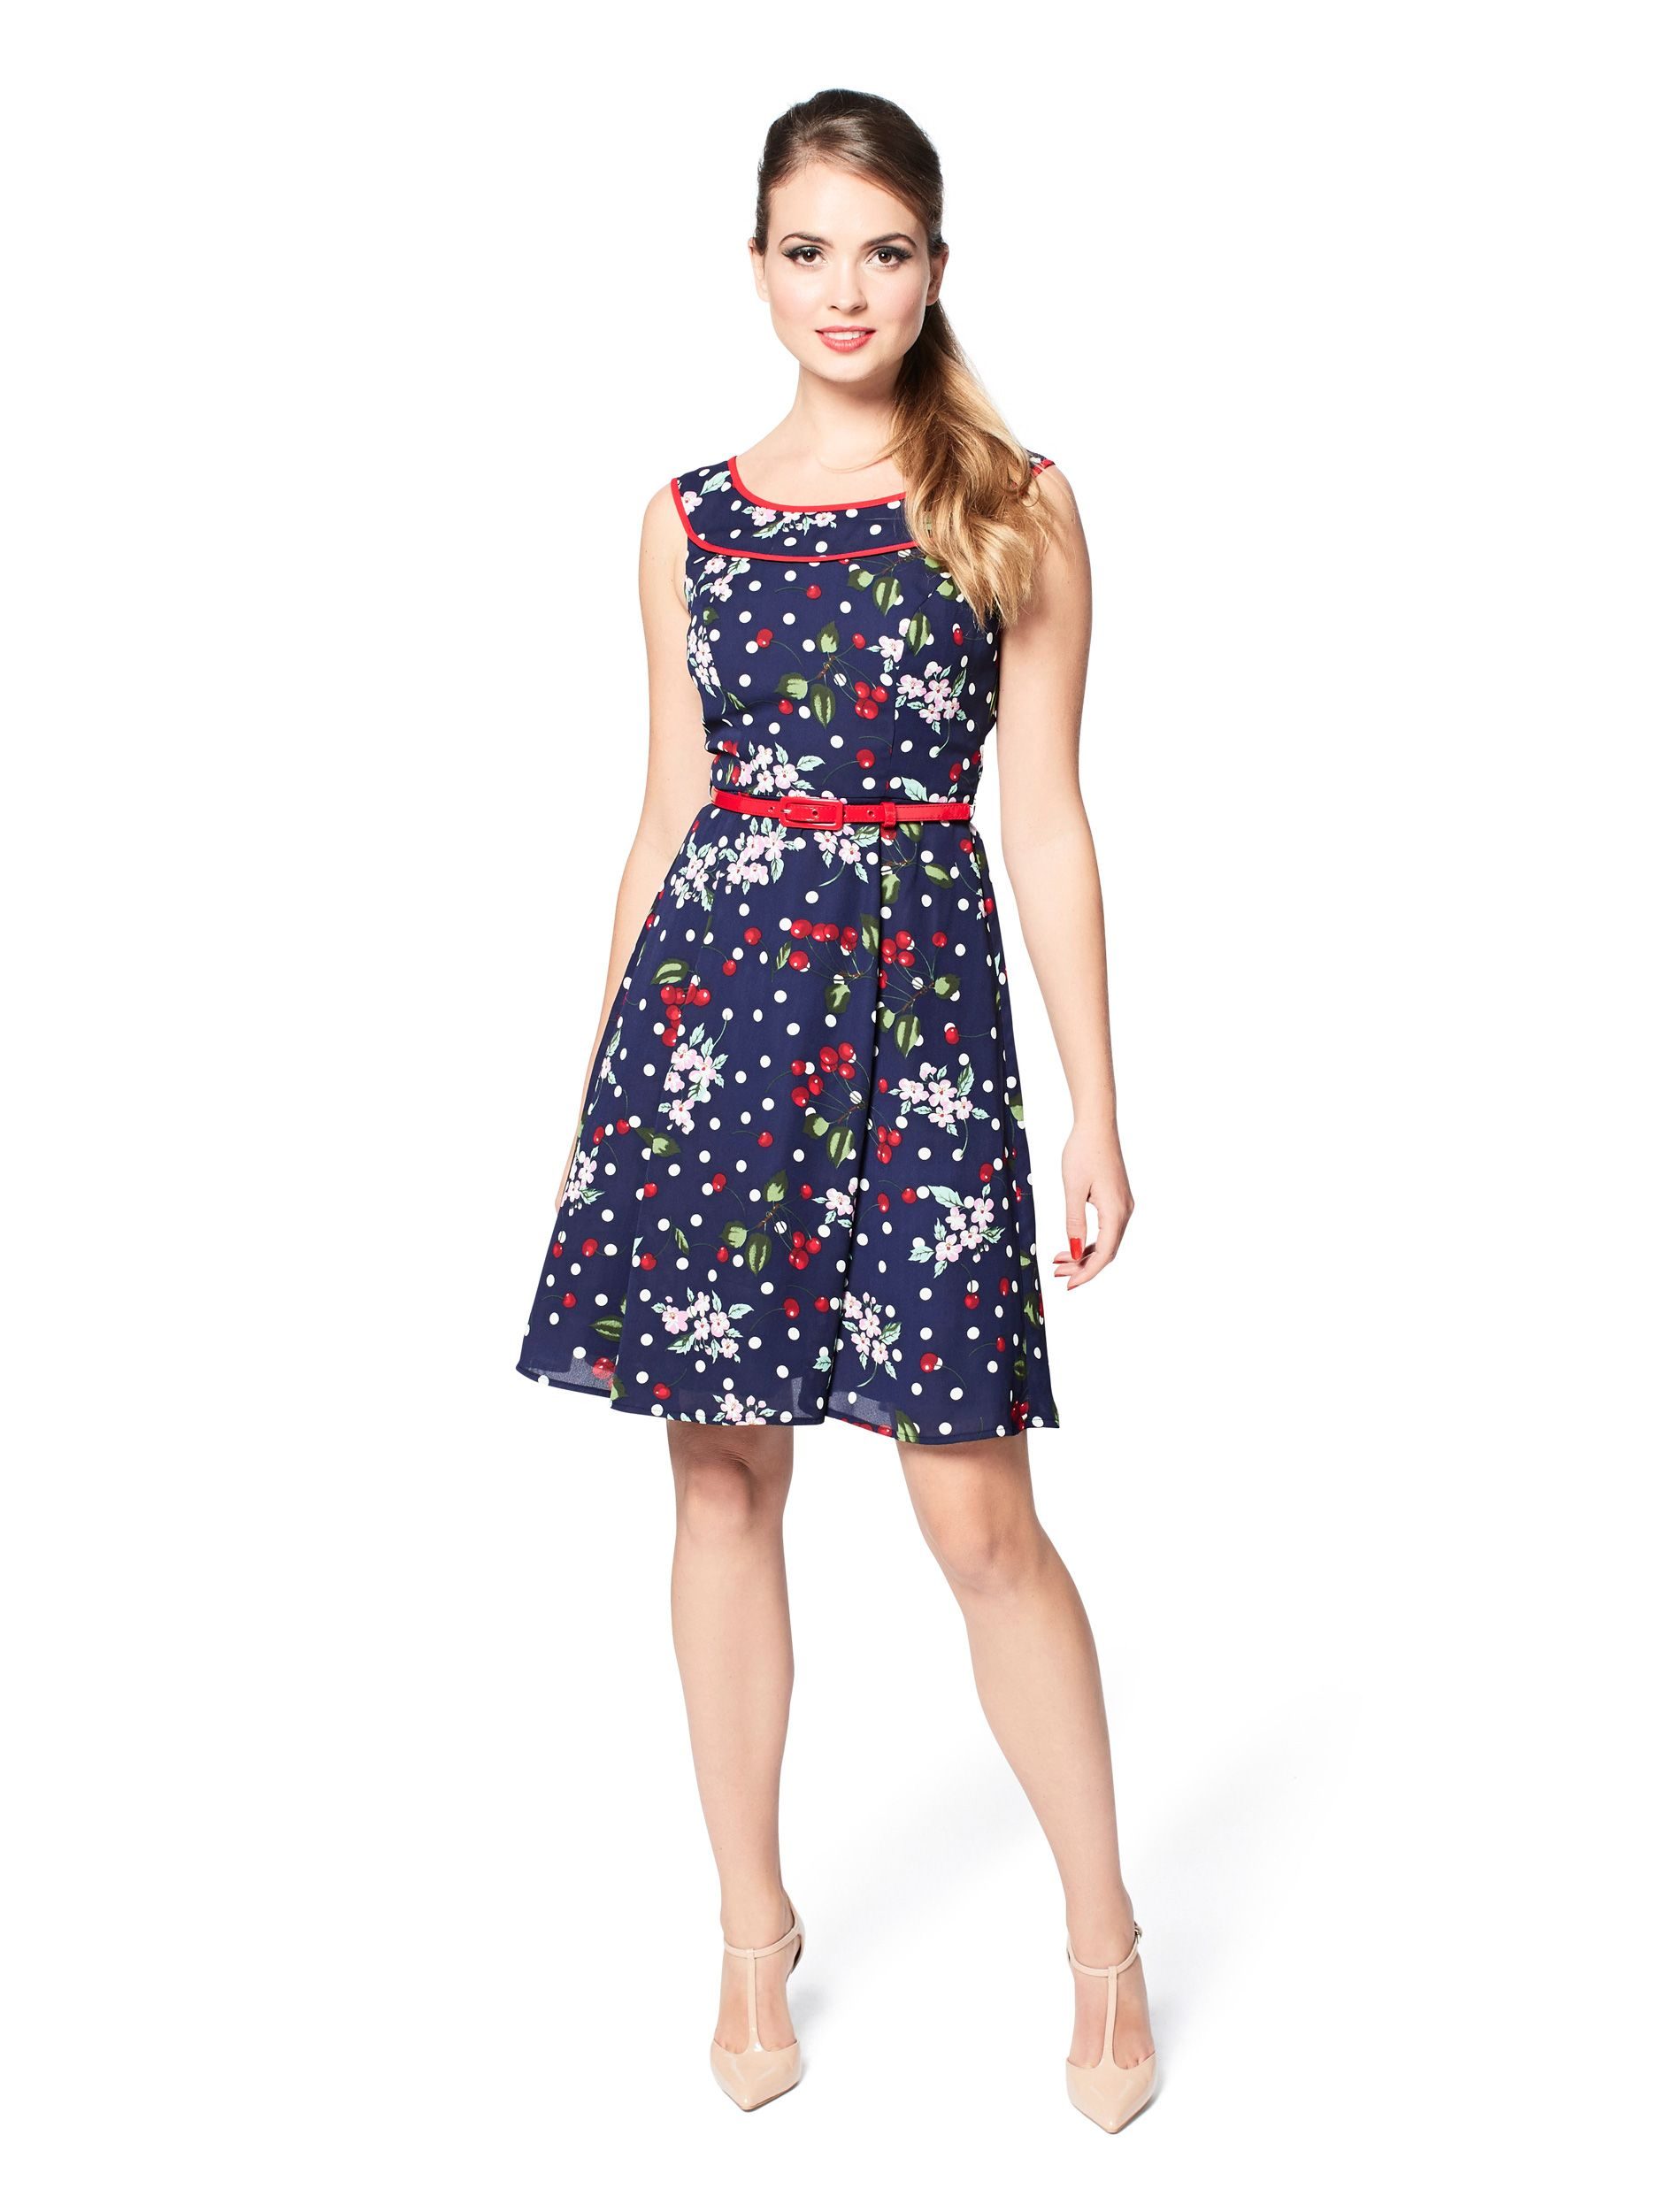 Cherry floral dress navy u multi dresses screenshots